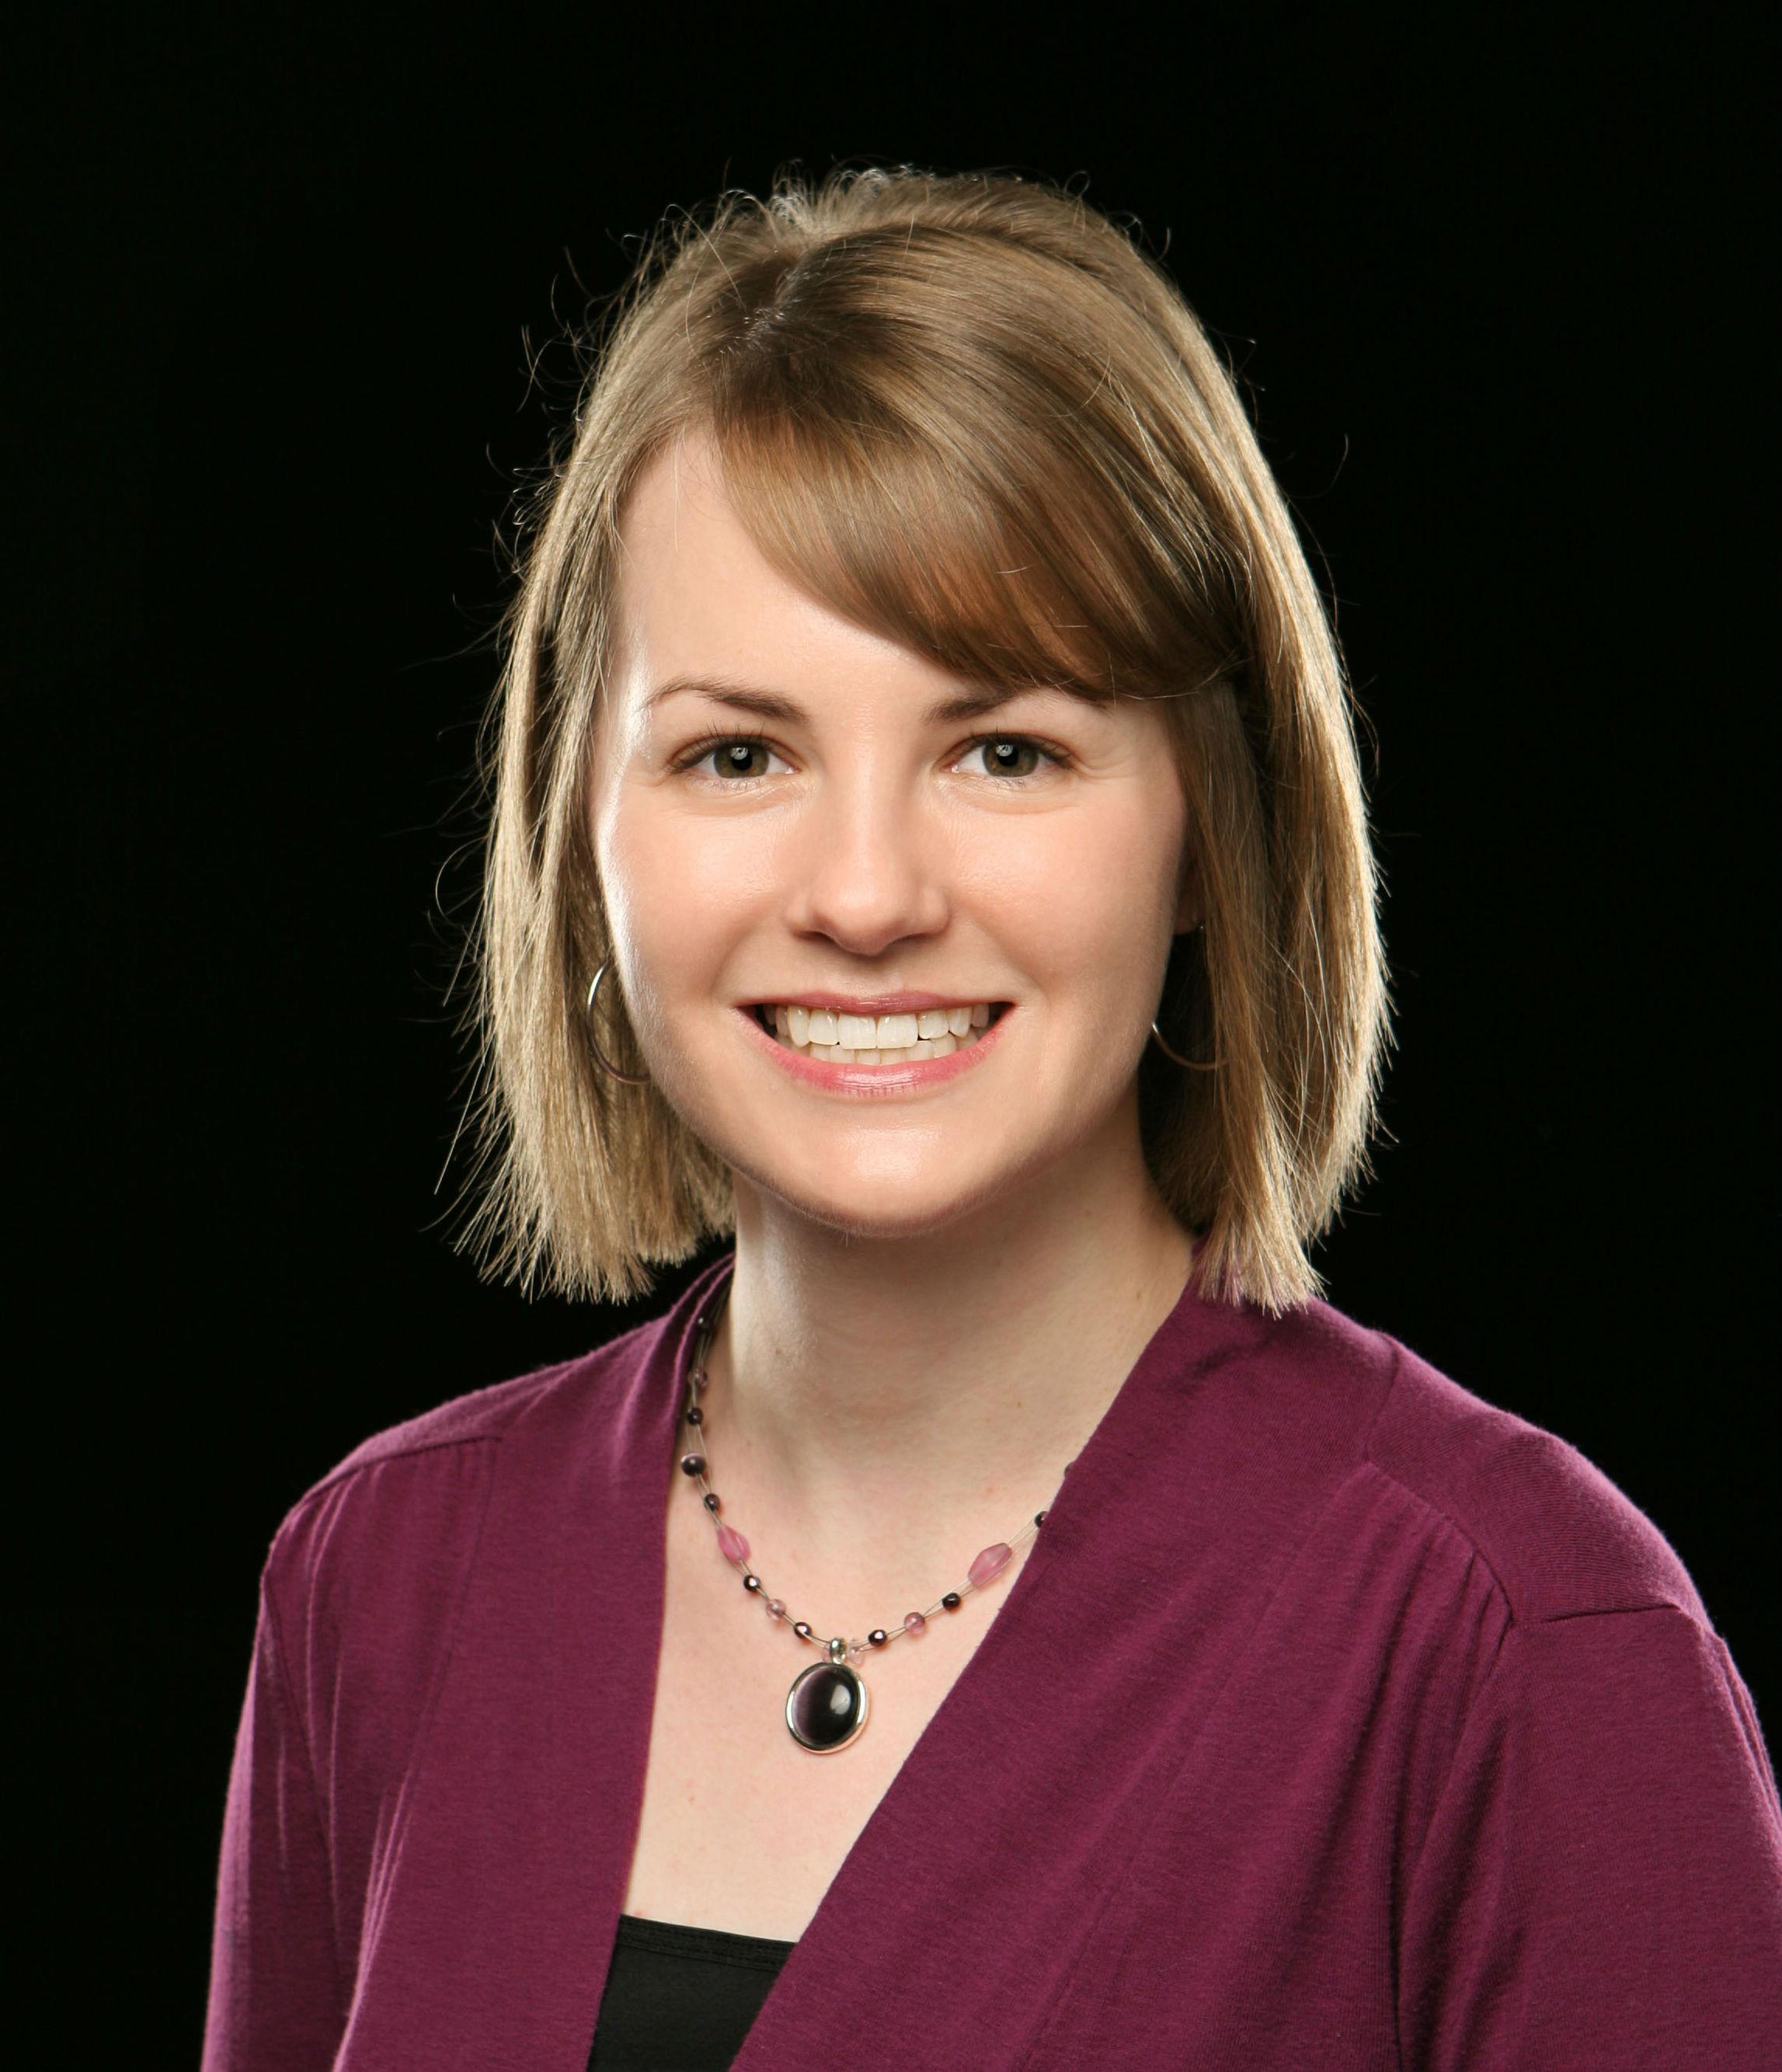 Deborah Hutcheon